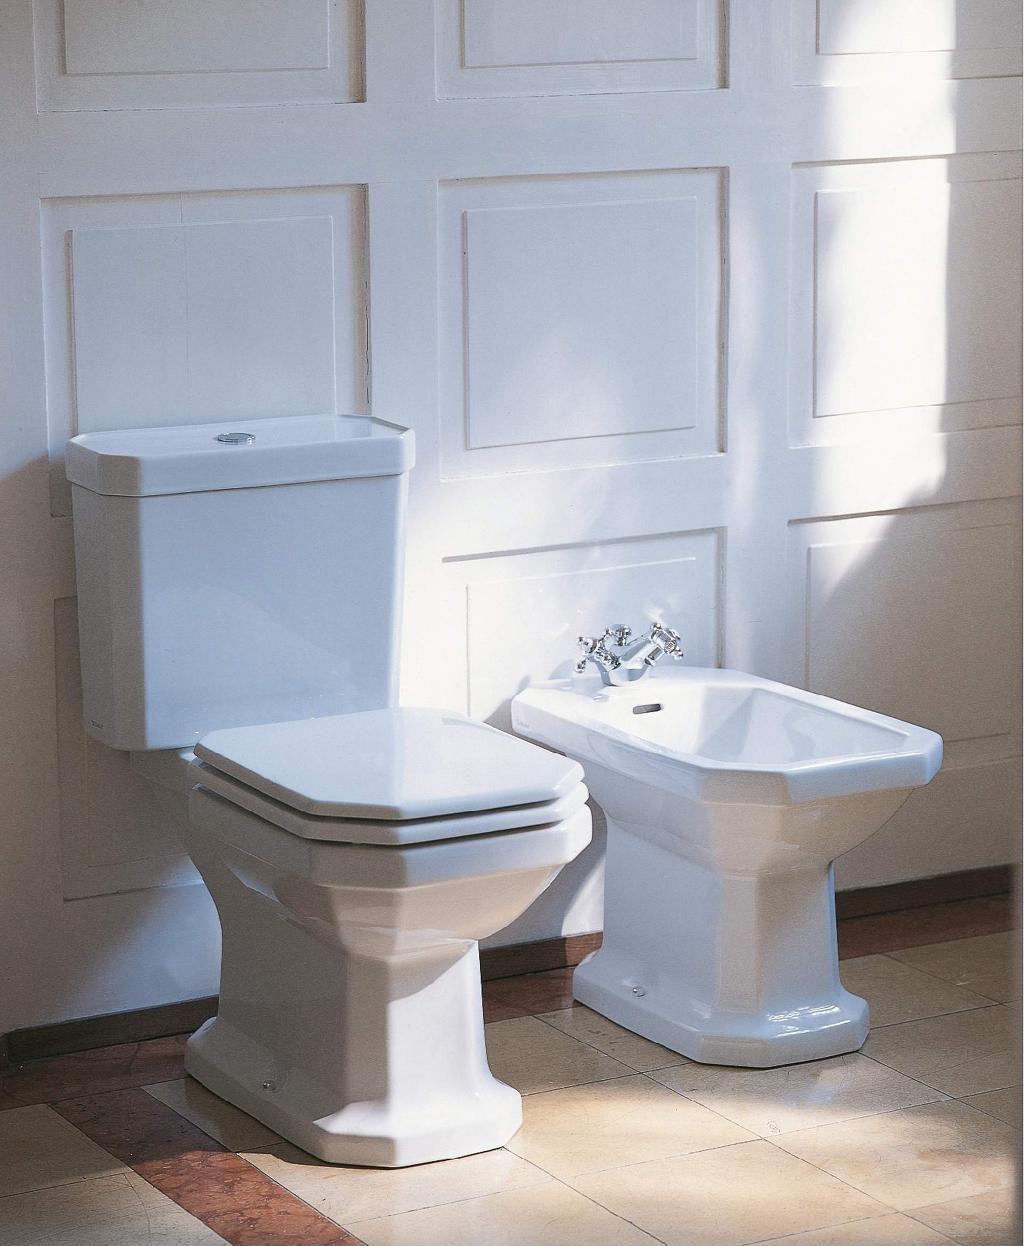 Duravit - Floor Standing Toilet 1930 | Duravit, Toilet and Showers